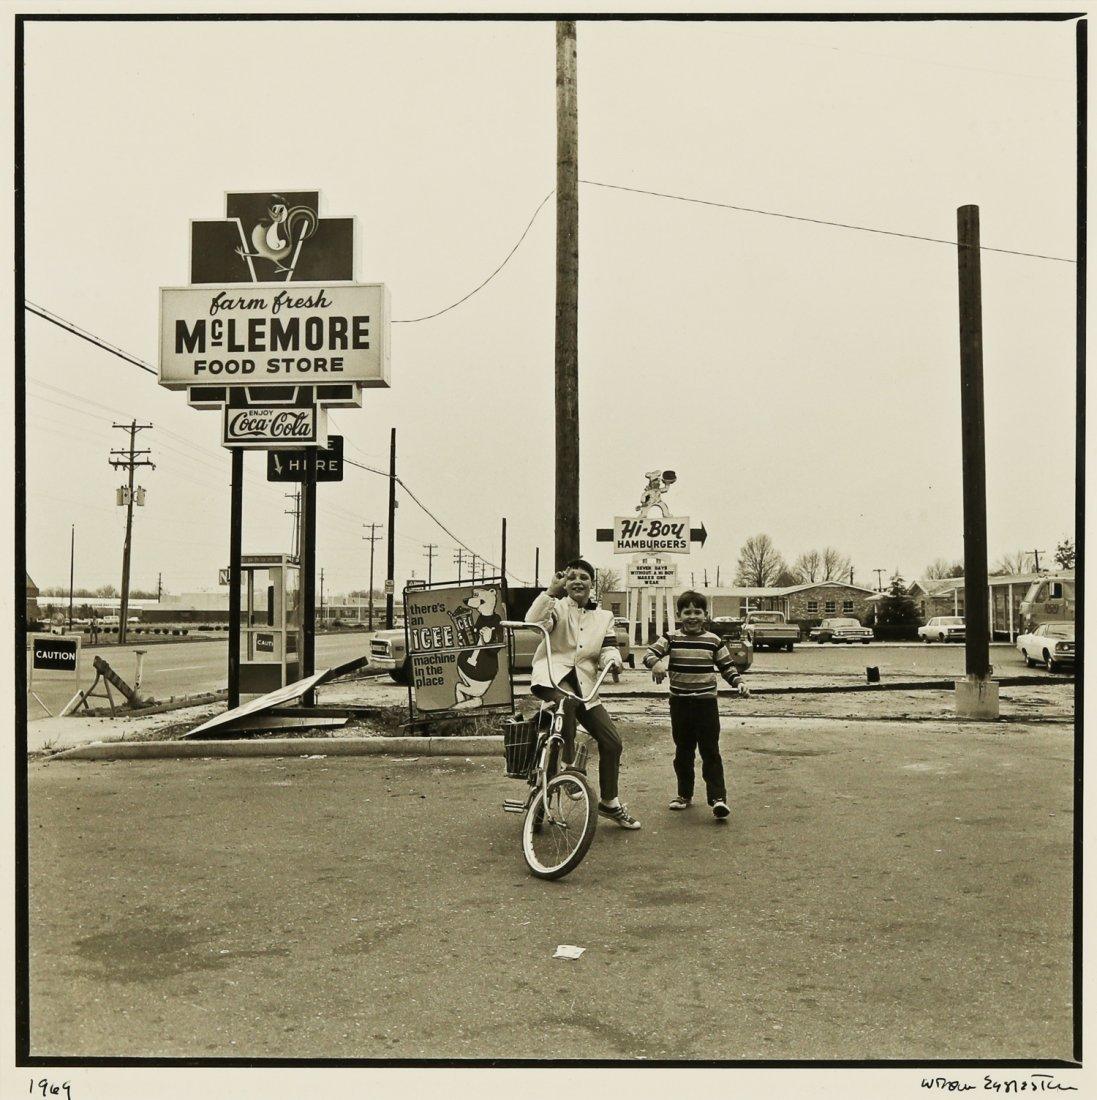 William Eggleston (b. 1939) Silver Gelatin Photograph,